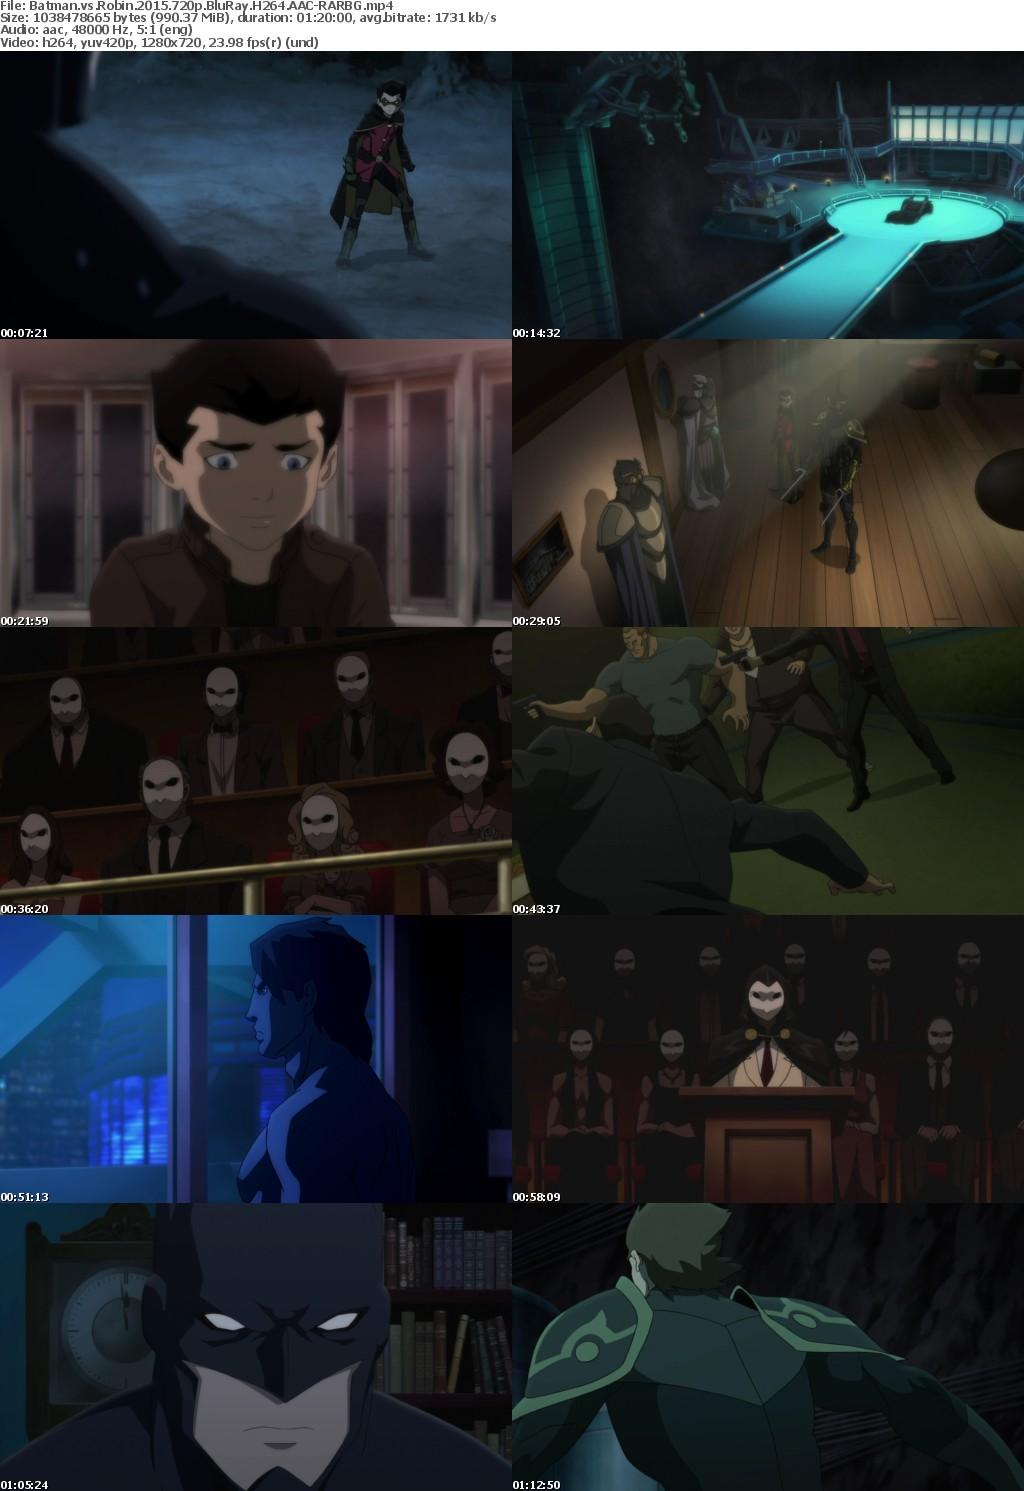 Batman vs Robin (2015) 720p BluRay H264 AAC-RARBG